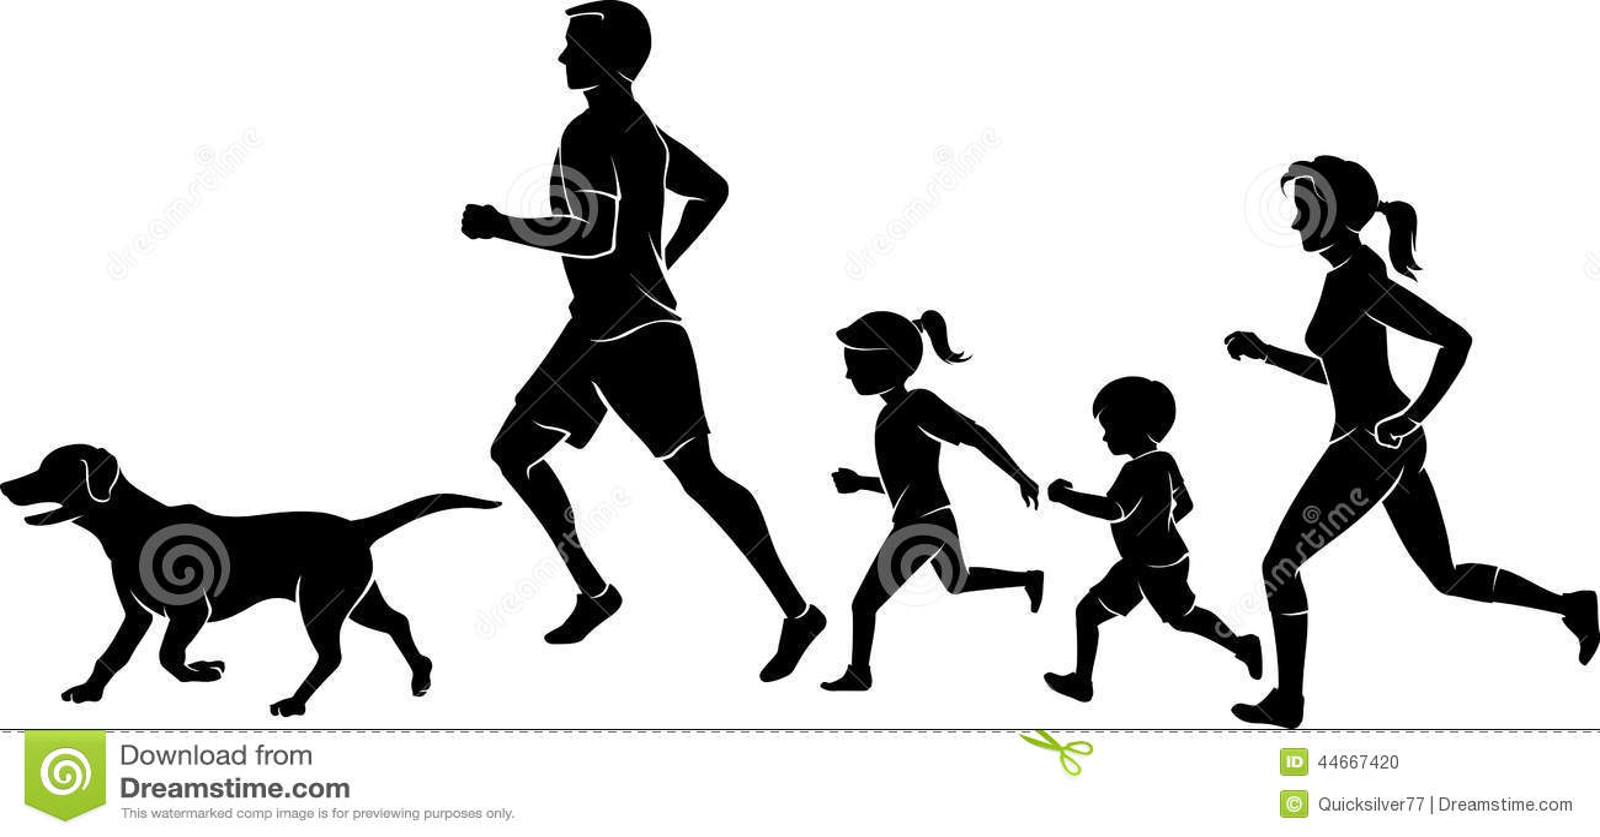 family jogging exercise stock illustration illustration of labrador rh dreamstime com